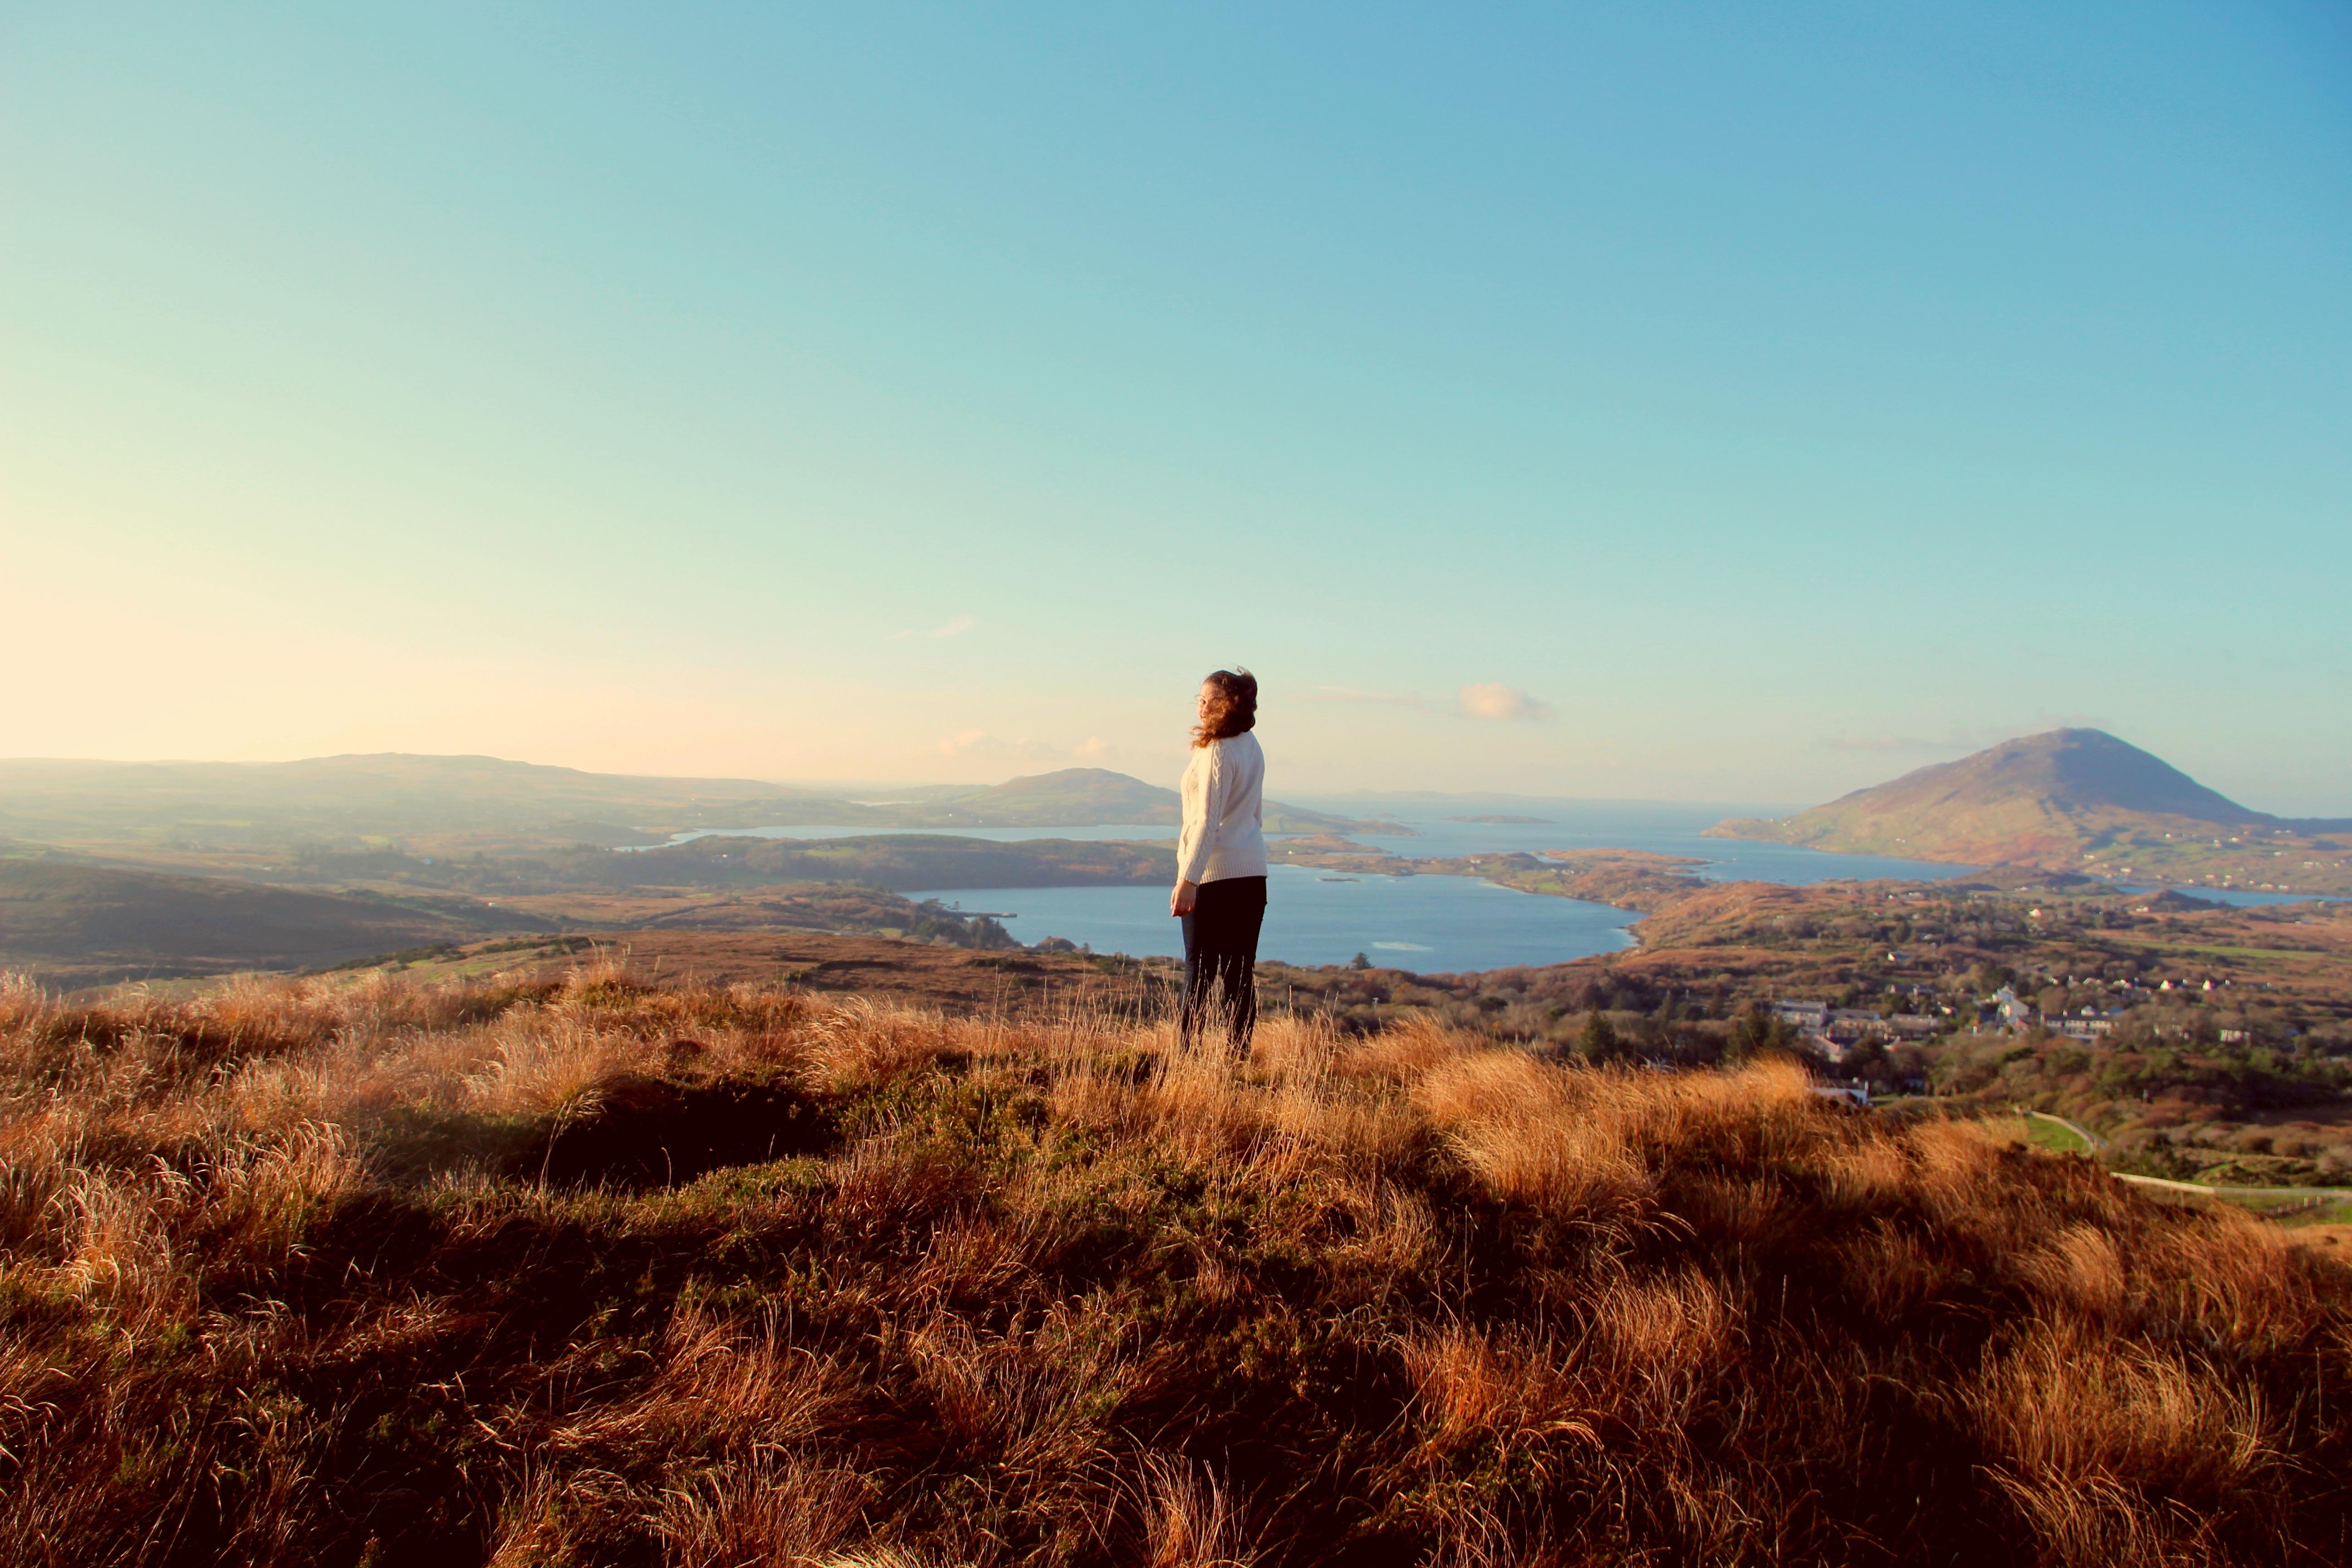 Ireland Girl on a field